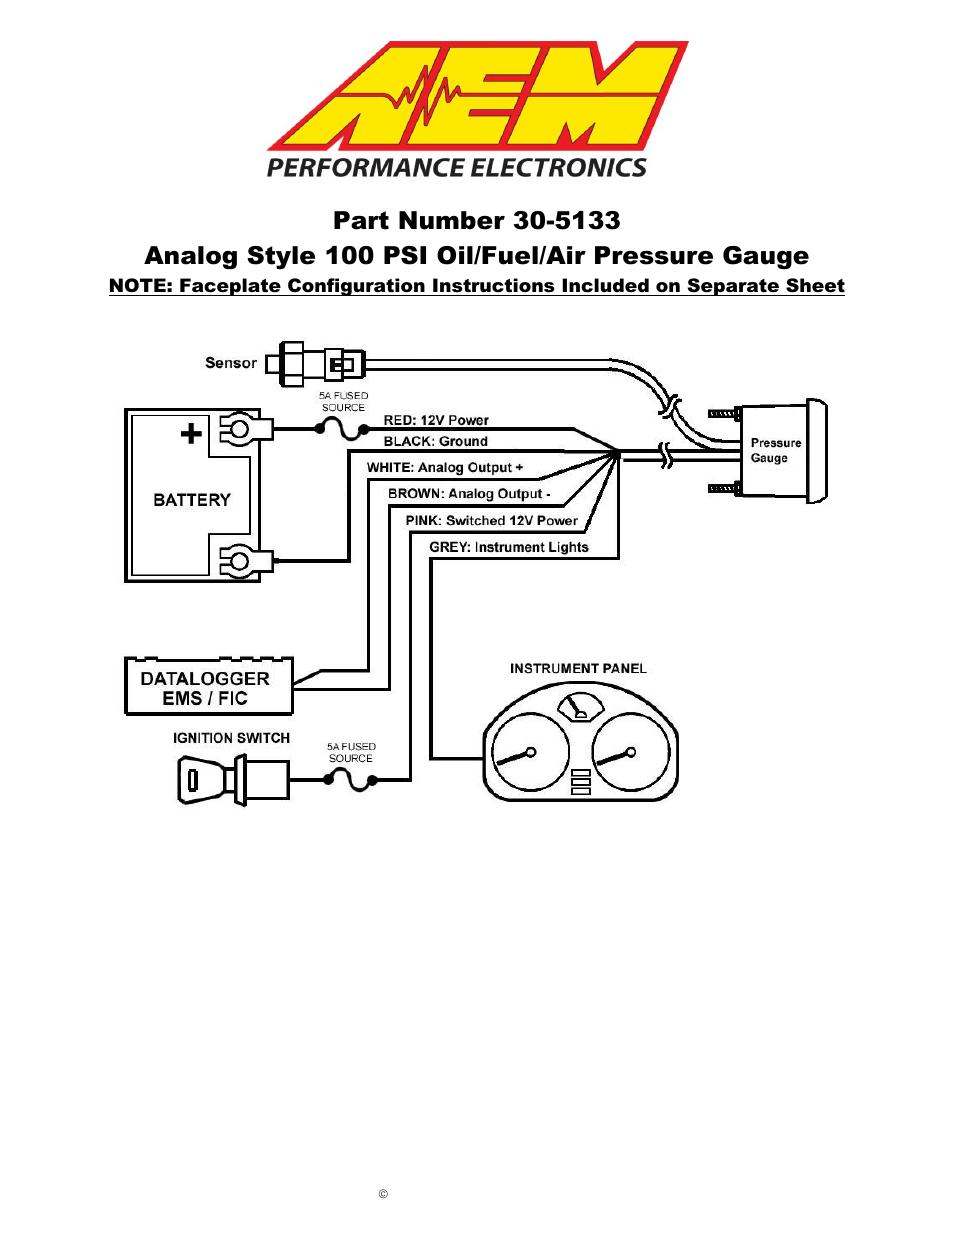 pricol oil pressure gauge wiring diagram 17th edition consumer unit air schematic best library cummins alternator aem 30 5135m analog